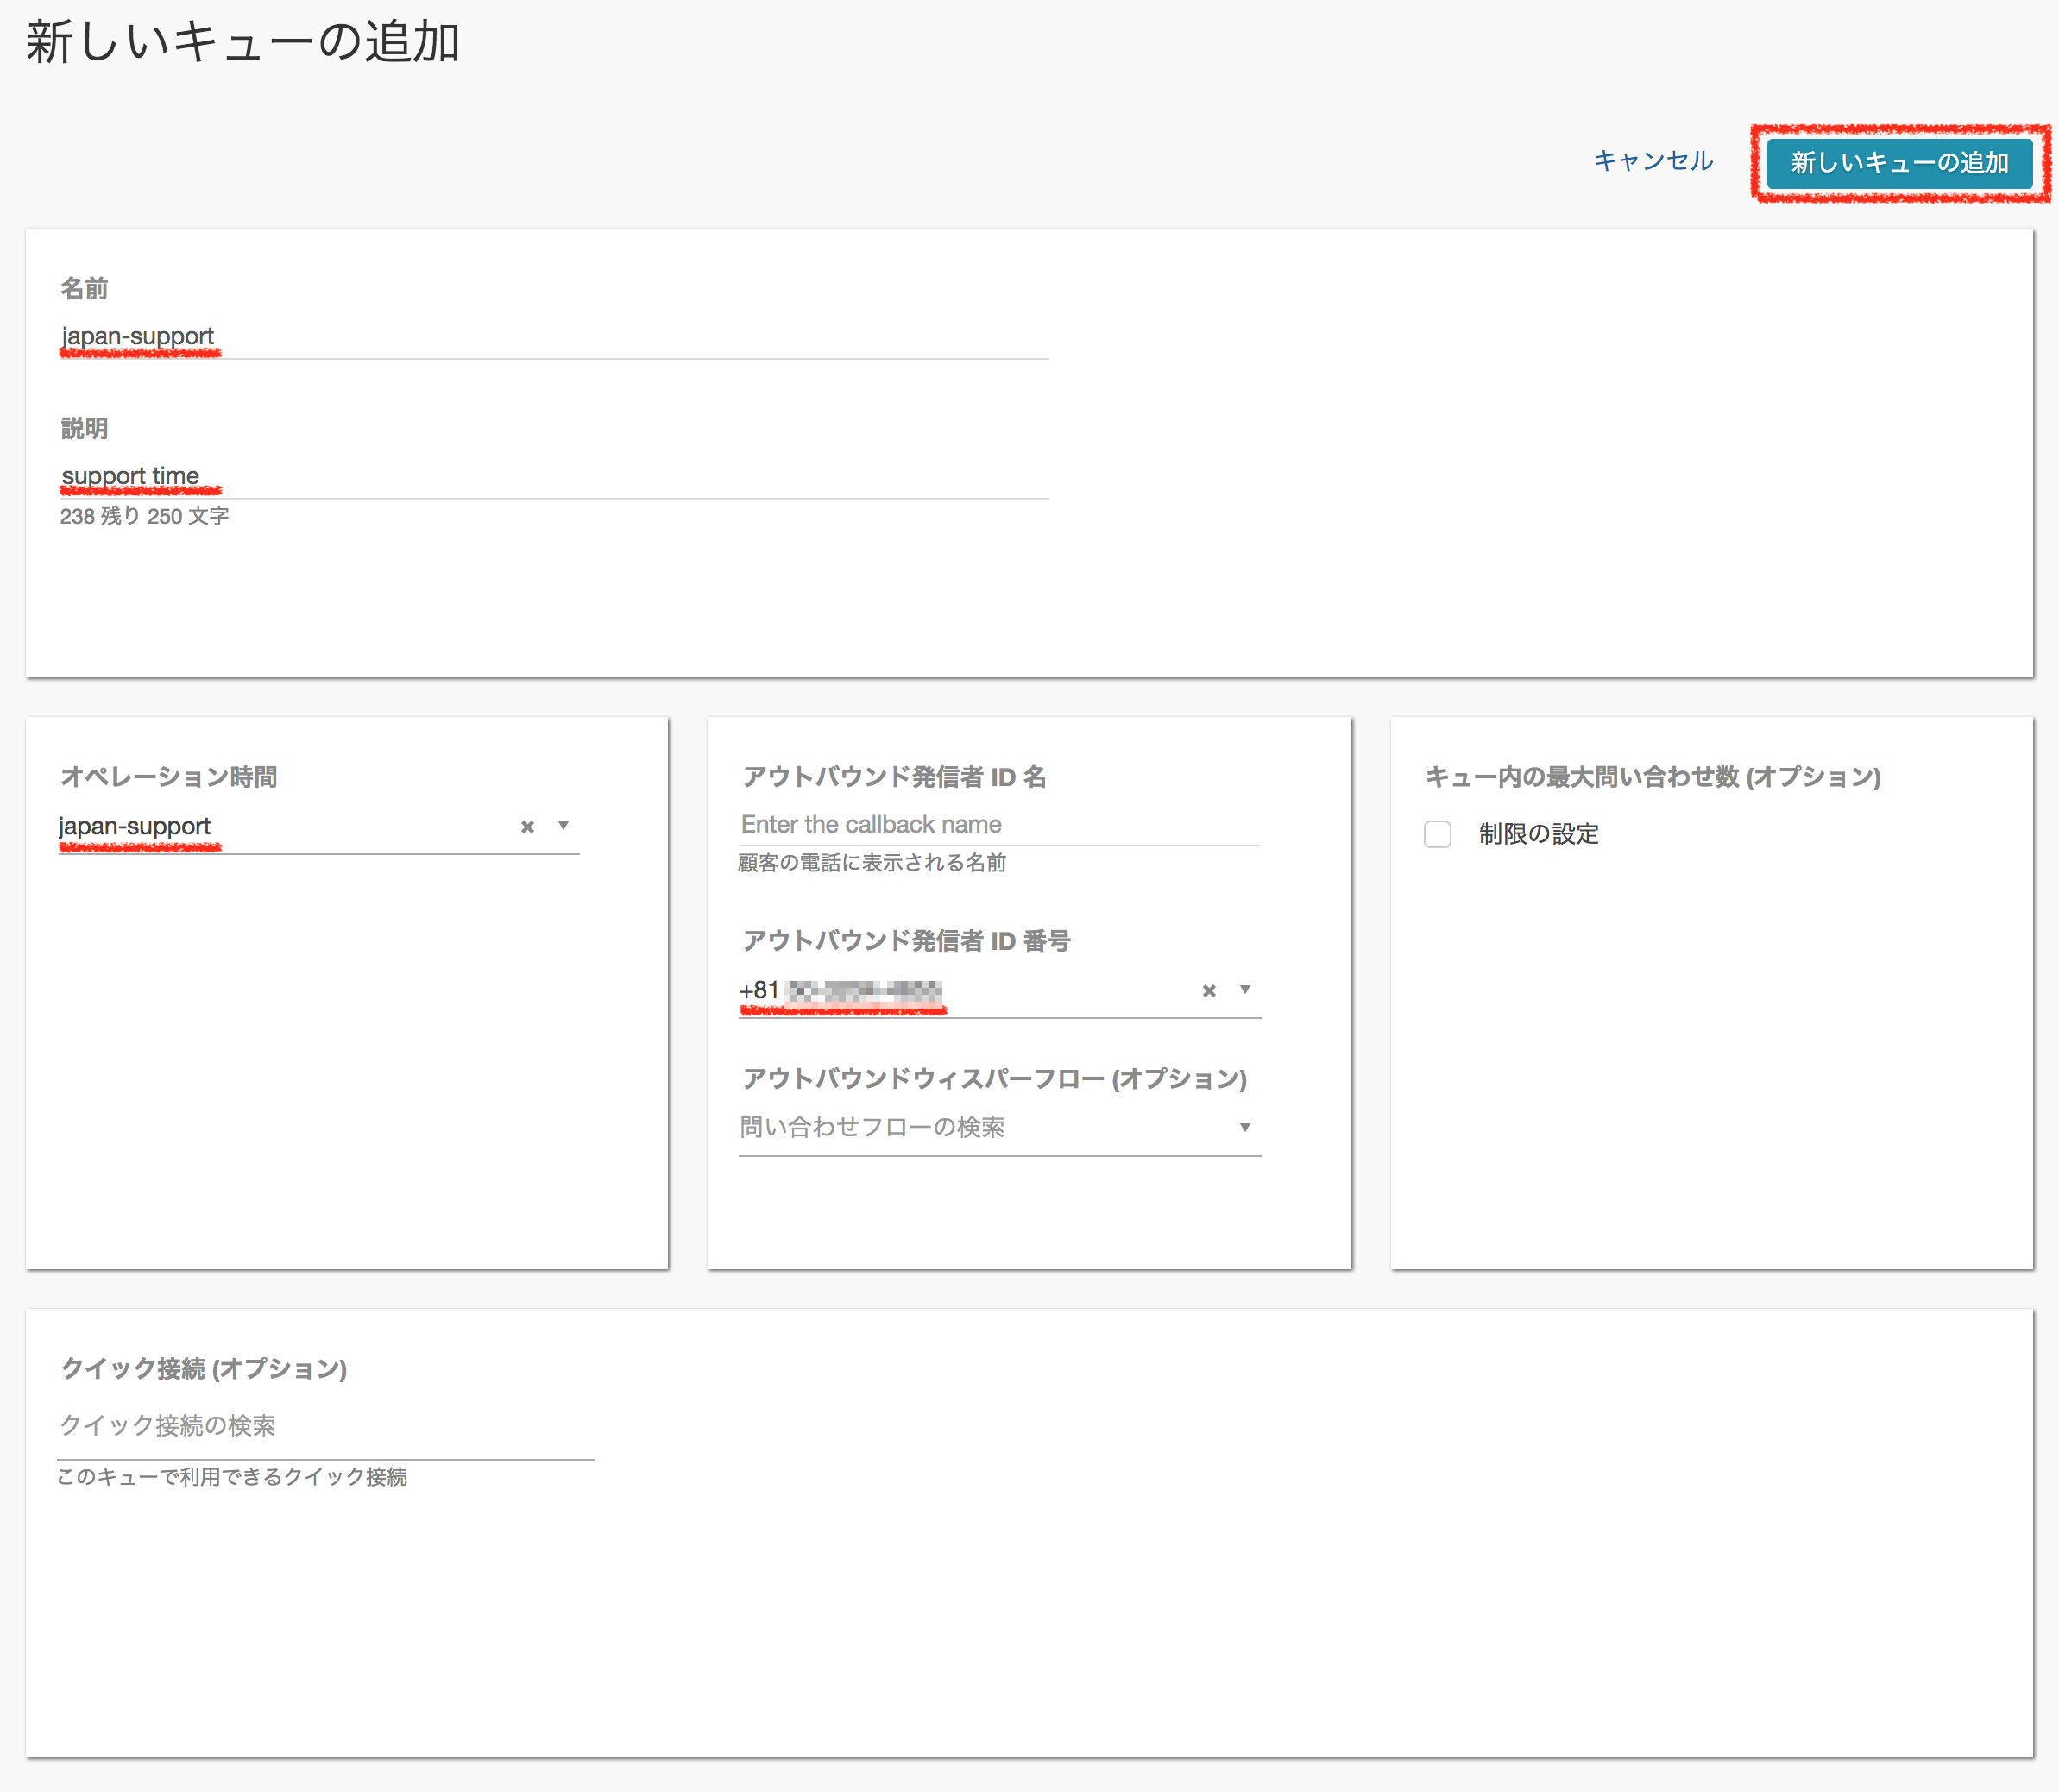 screencapture-kooooohei-awsapps-connect-queues-create-1517227855838.png